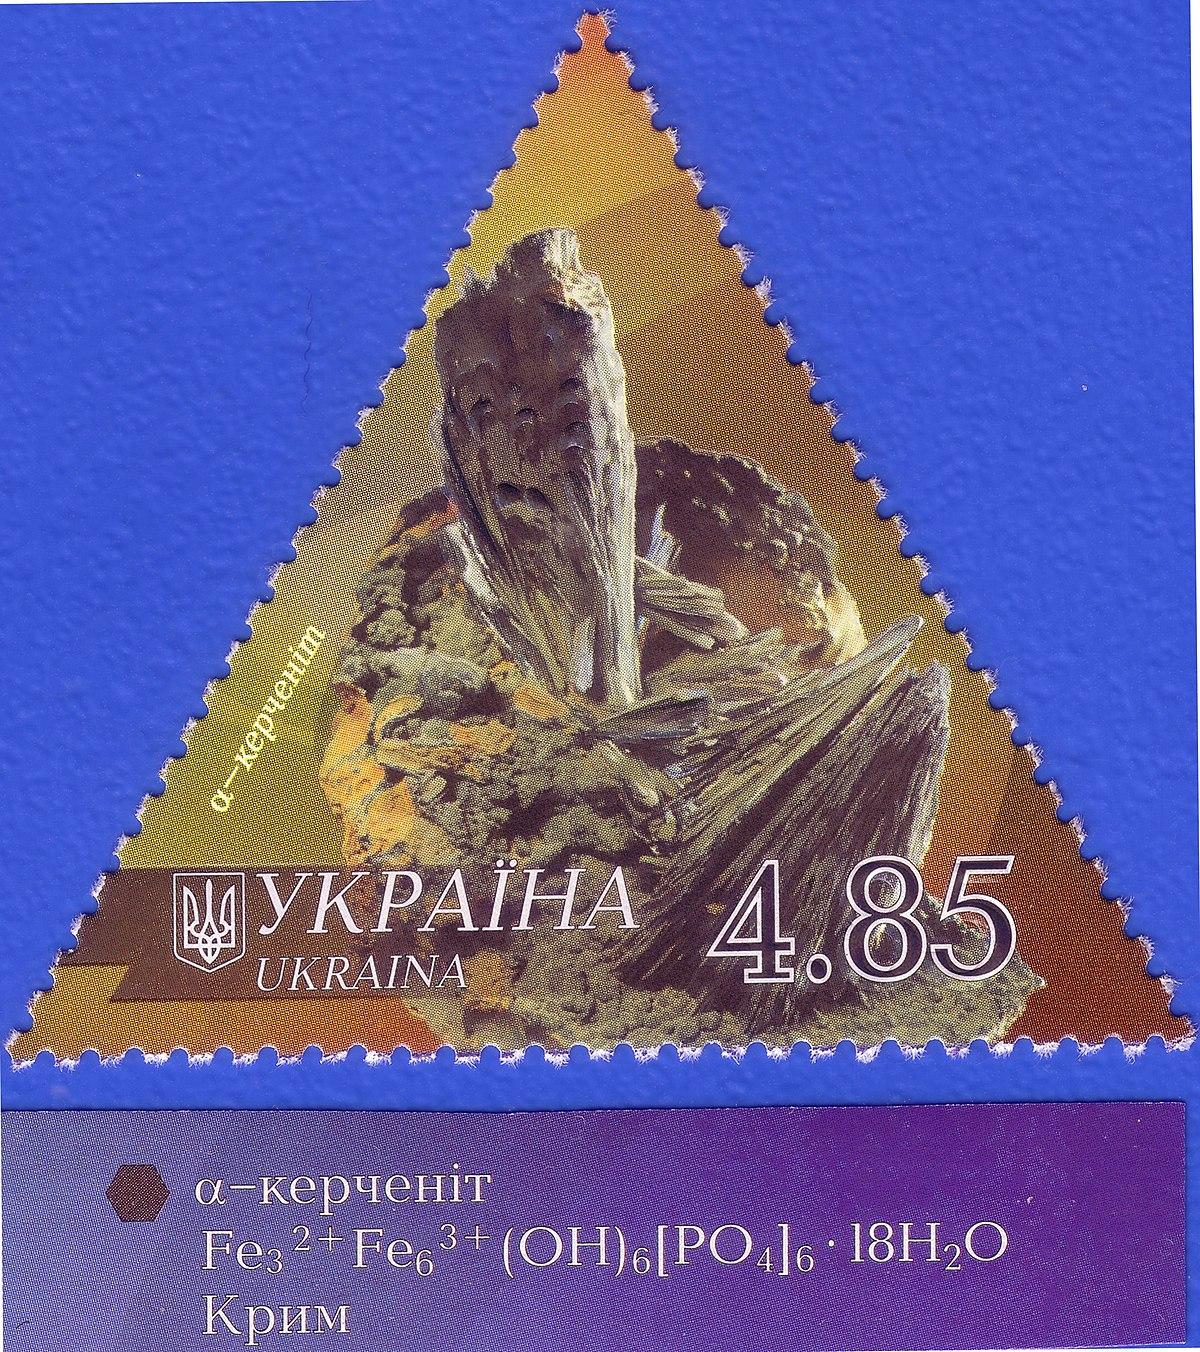 Фосфаты — Википедия фосфат